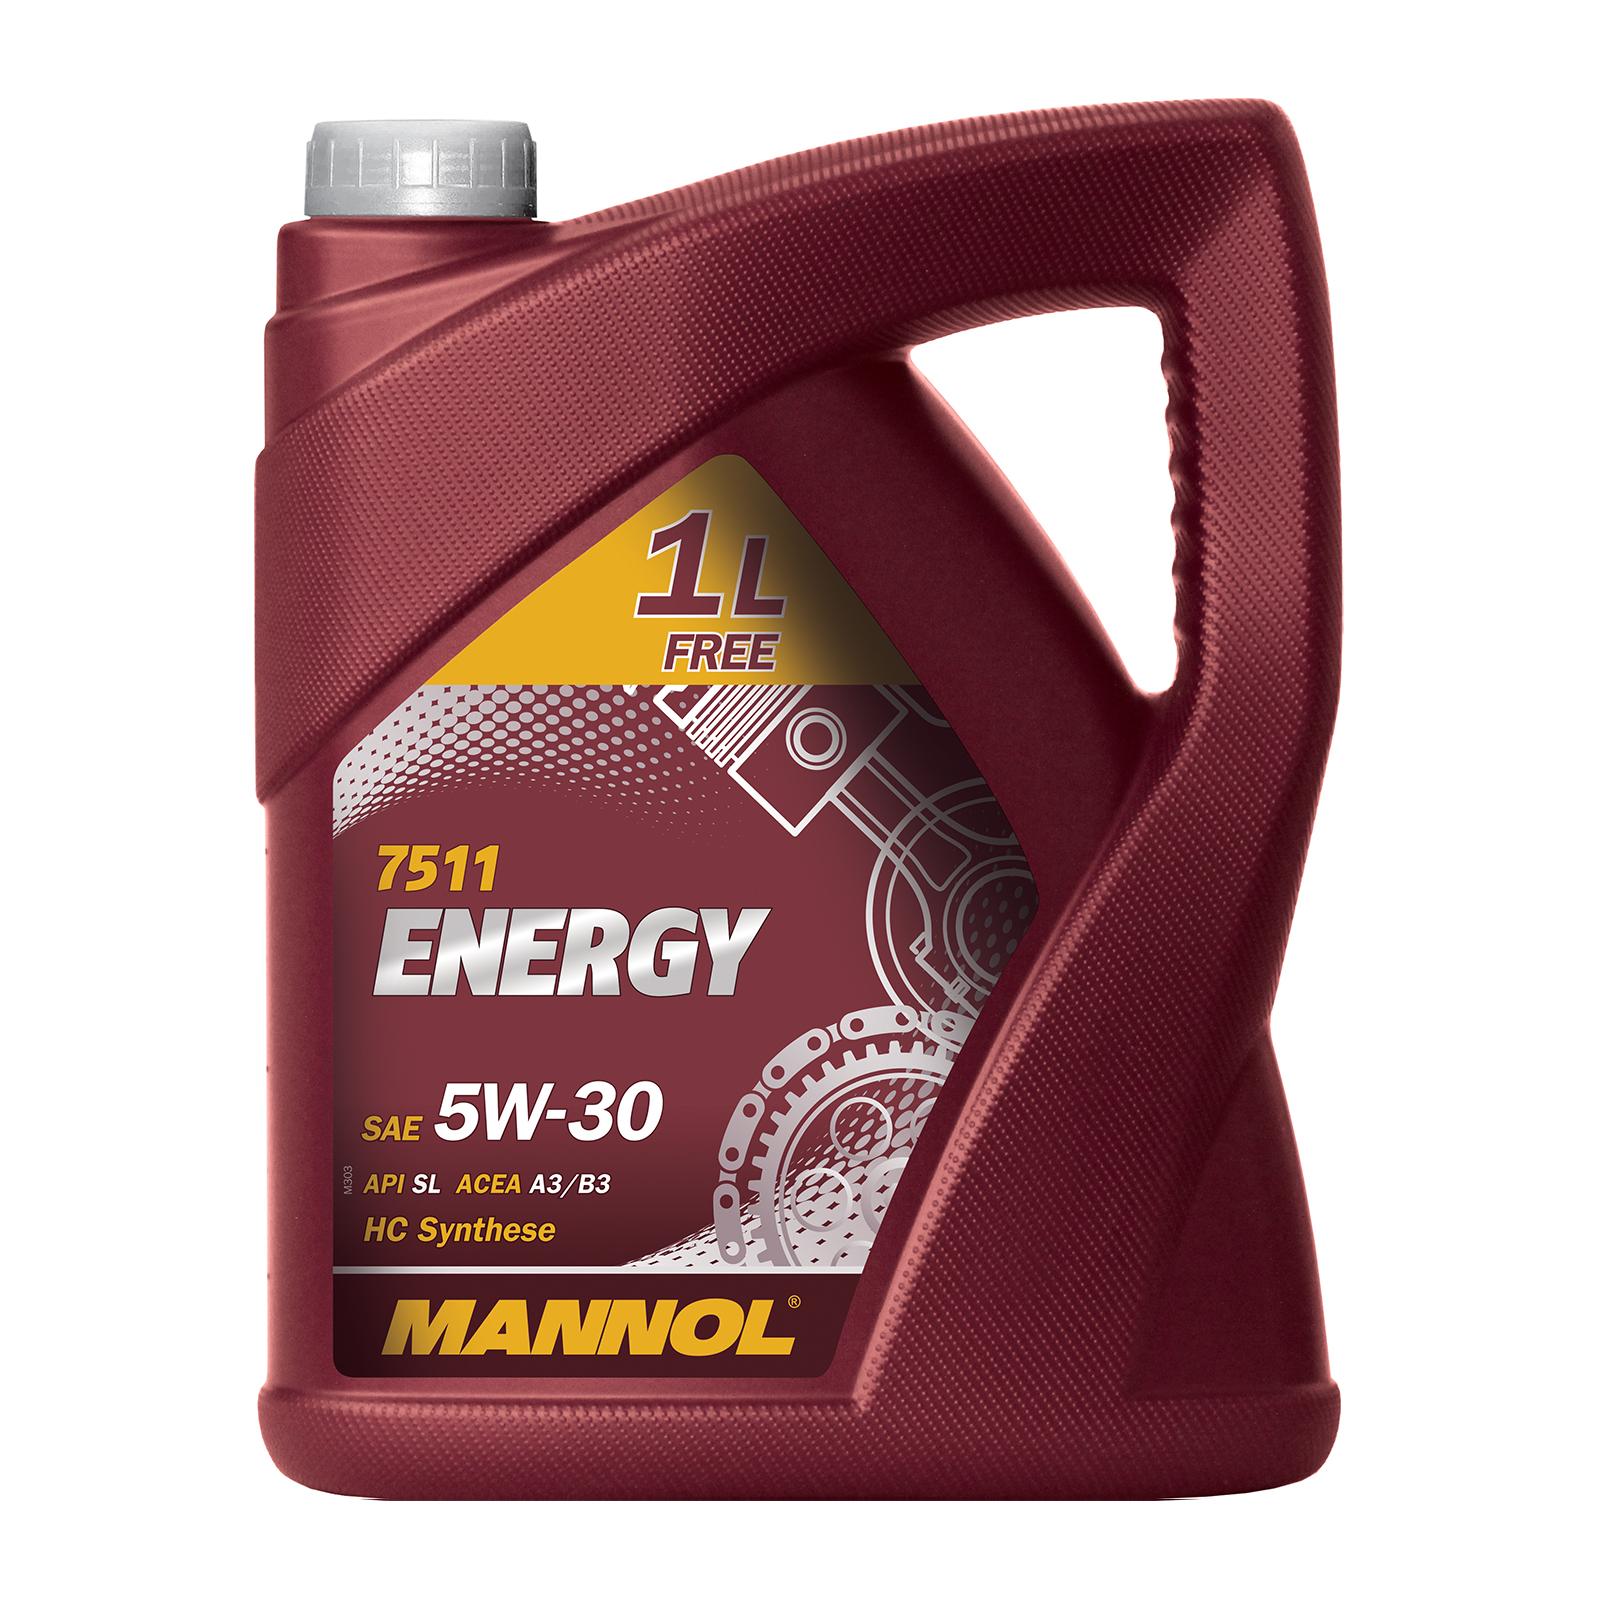 5 Liter MANNOL SAE 5W-30 ENERGY inkl. Versand